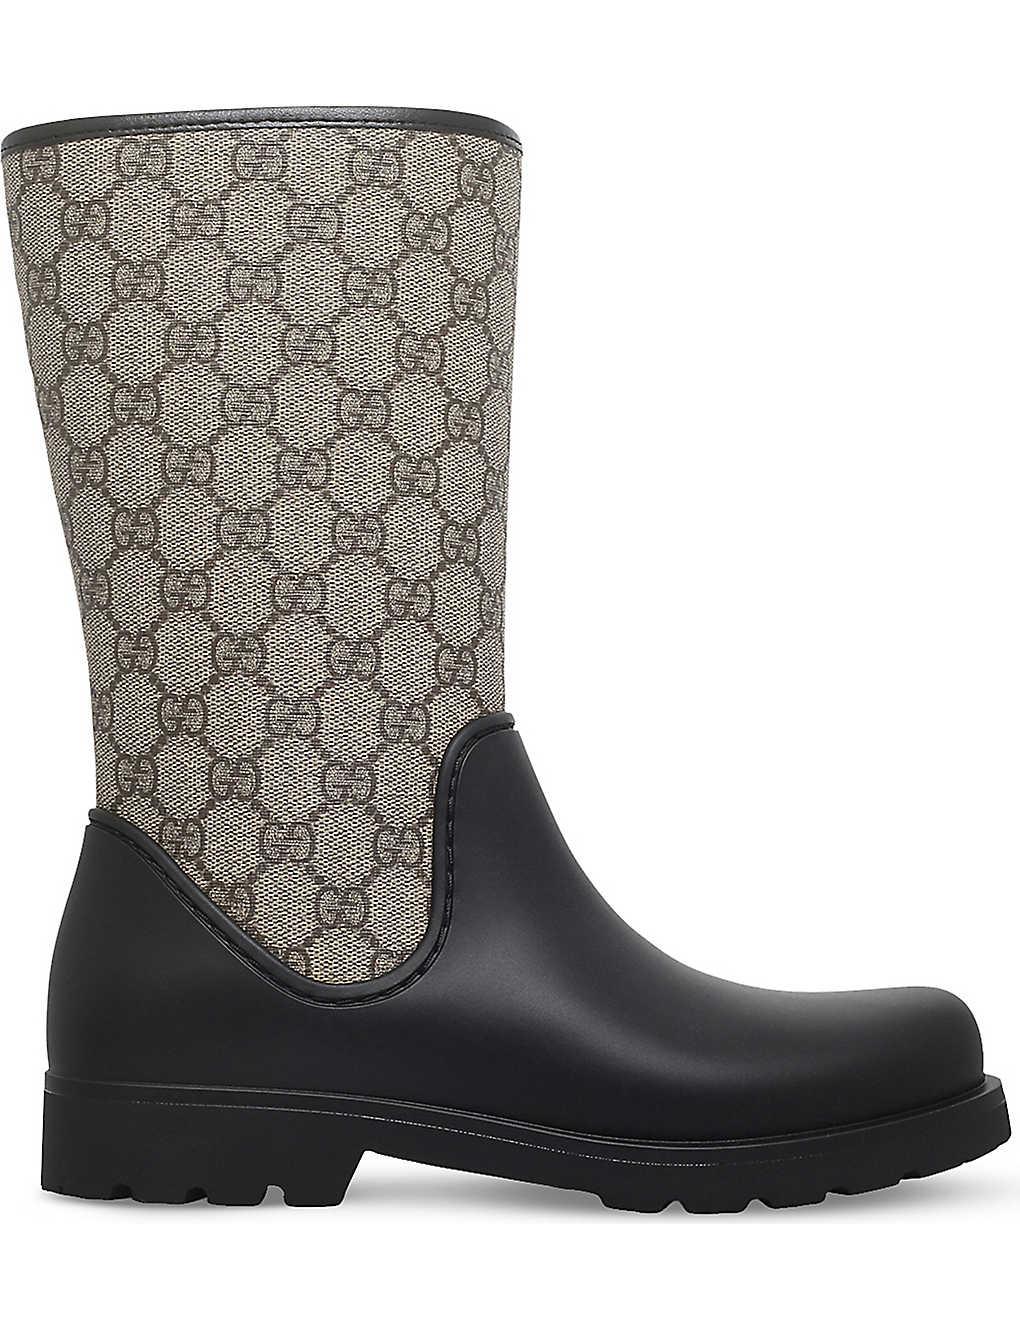 dadd62712157 GUCCI - Rainy GG supreme rain boots 8-10 years | Selfridges.com